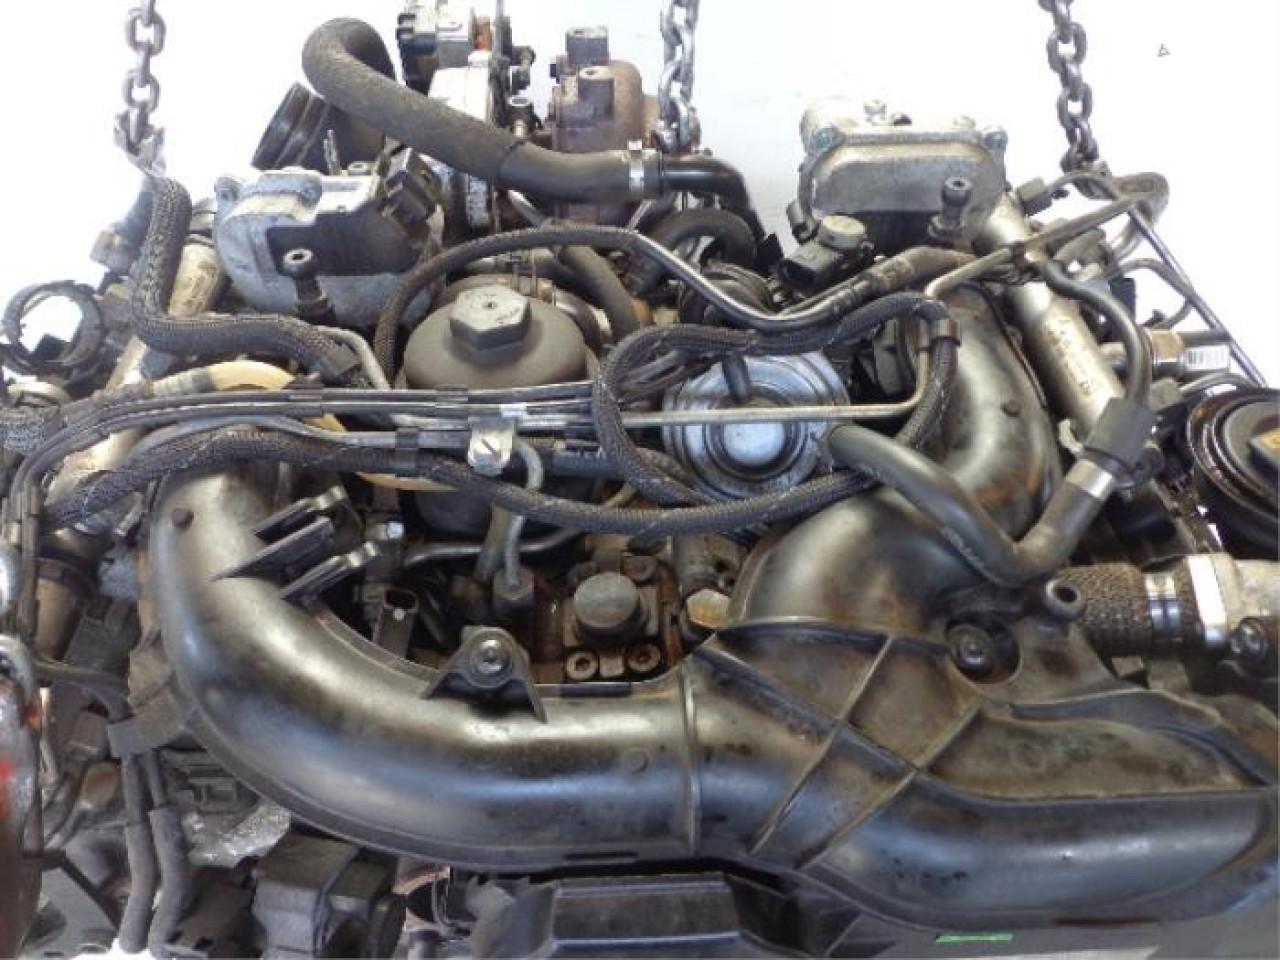 Motor fara accesorii audi a6 4f 2.7 tdi bpp 180 cai